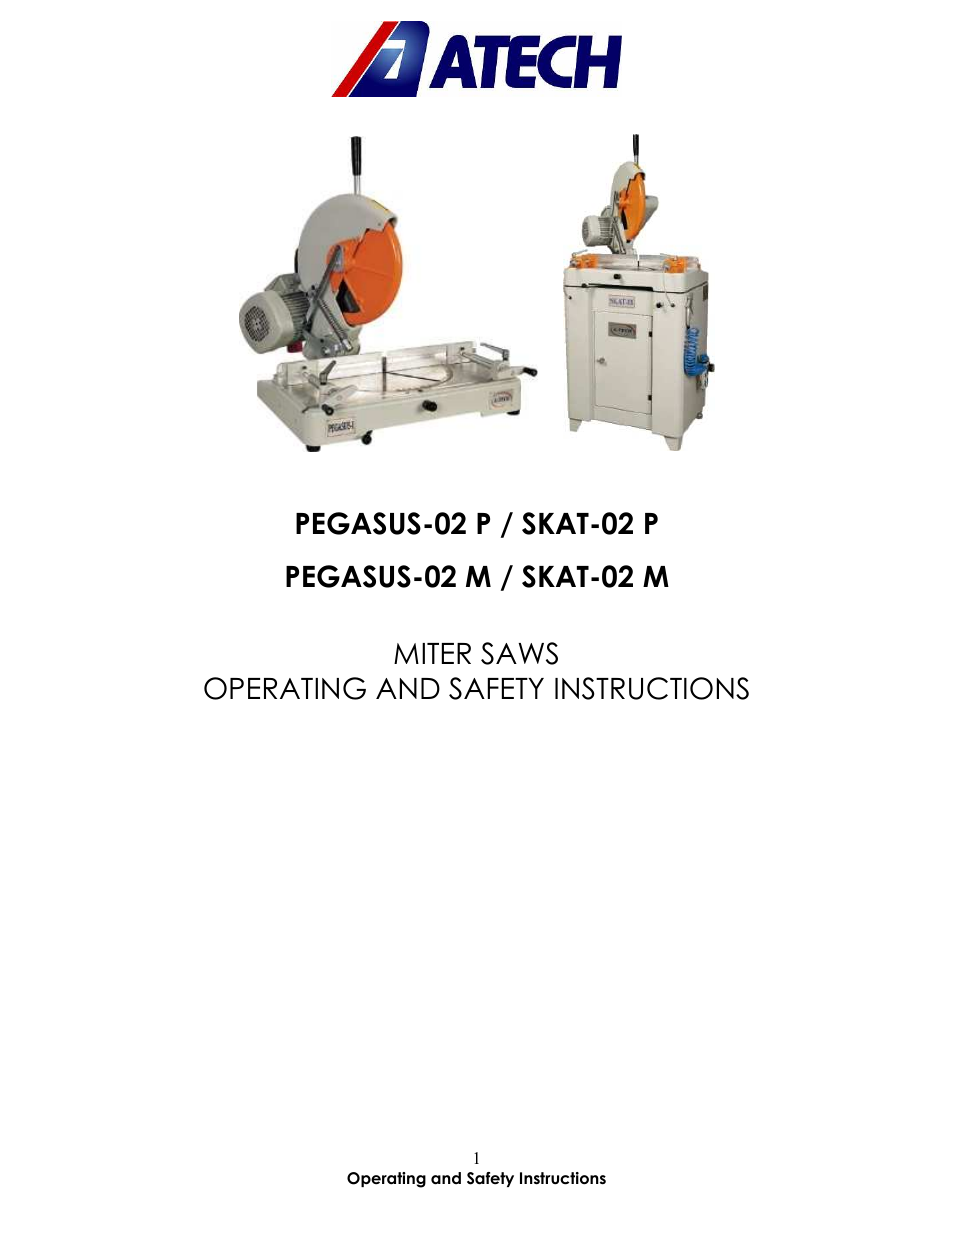 atech tech skat 02 p user manual 22 pages also for pegasus 02 m rh manualsdir com Atech Logistics Atech Distribution